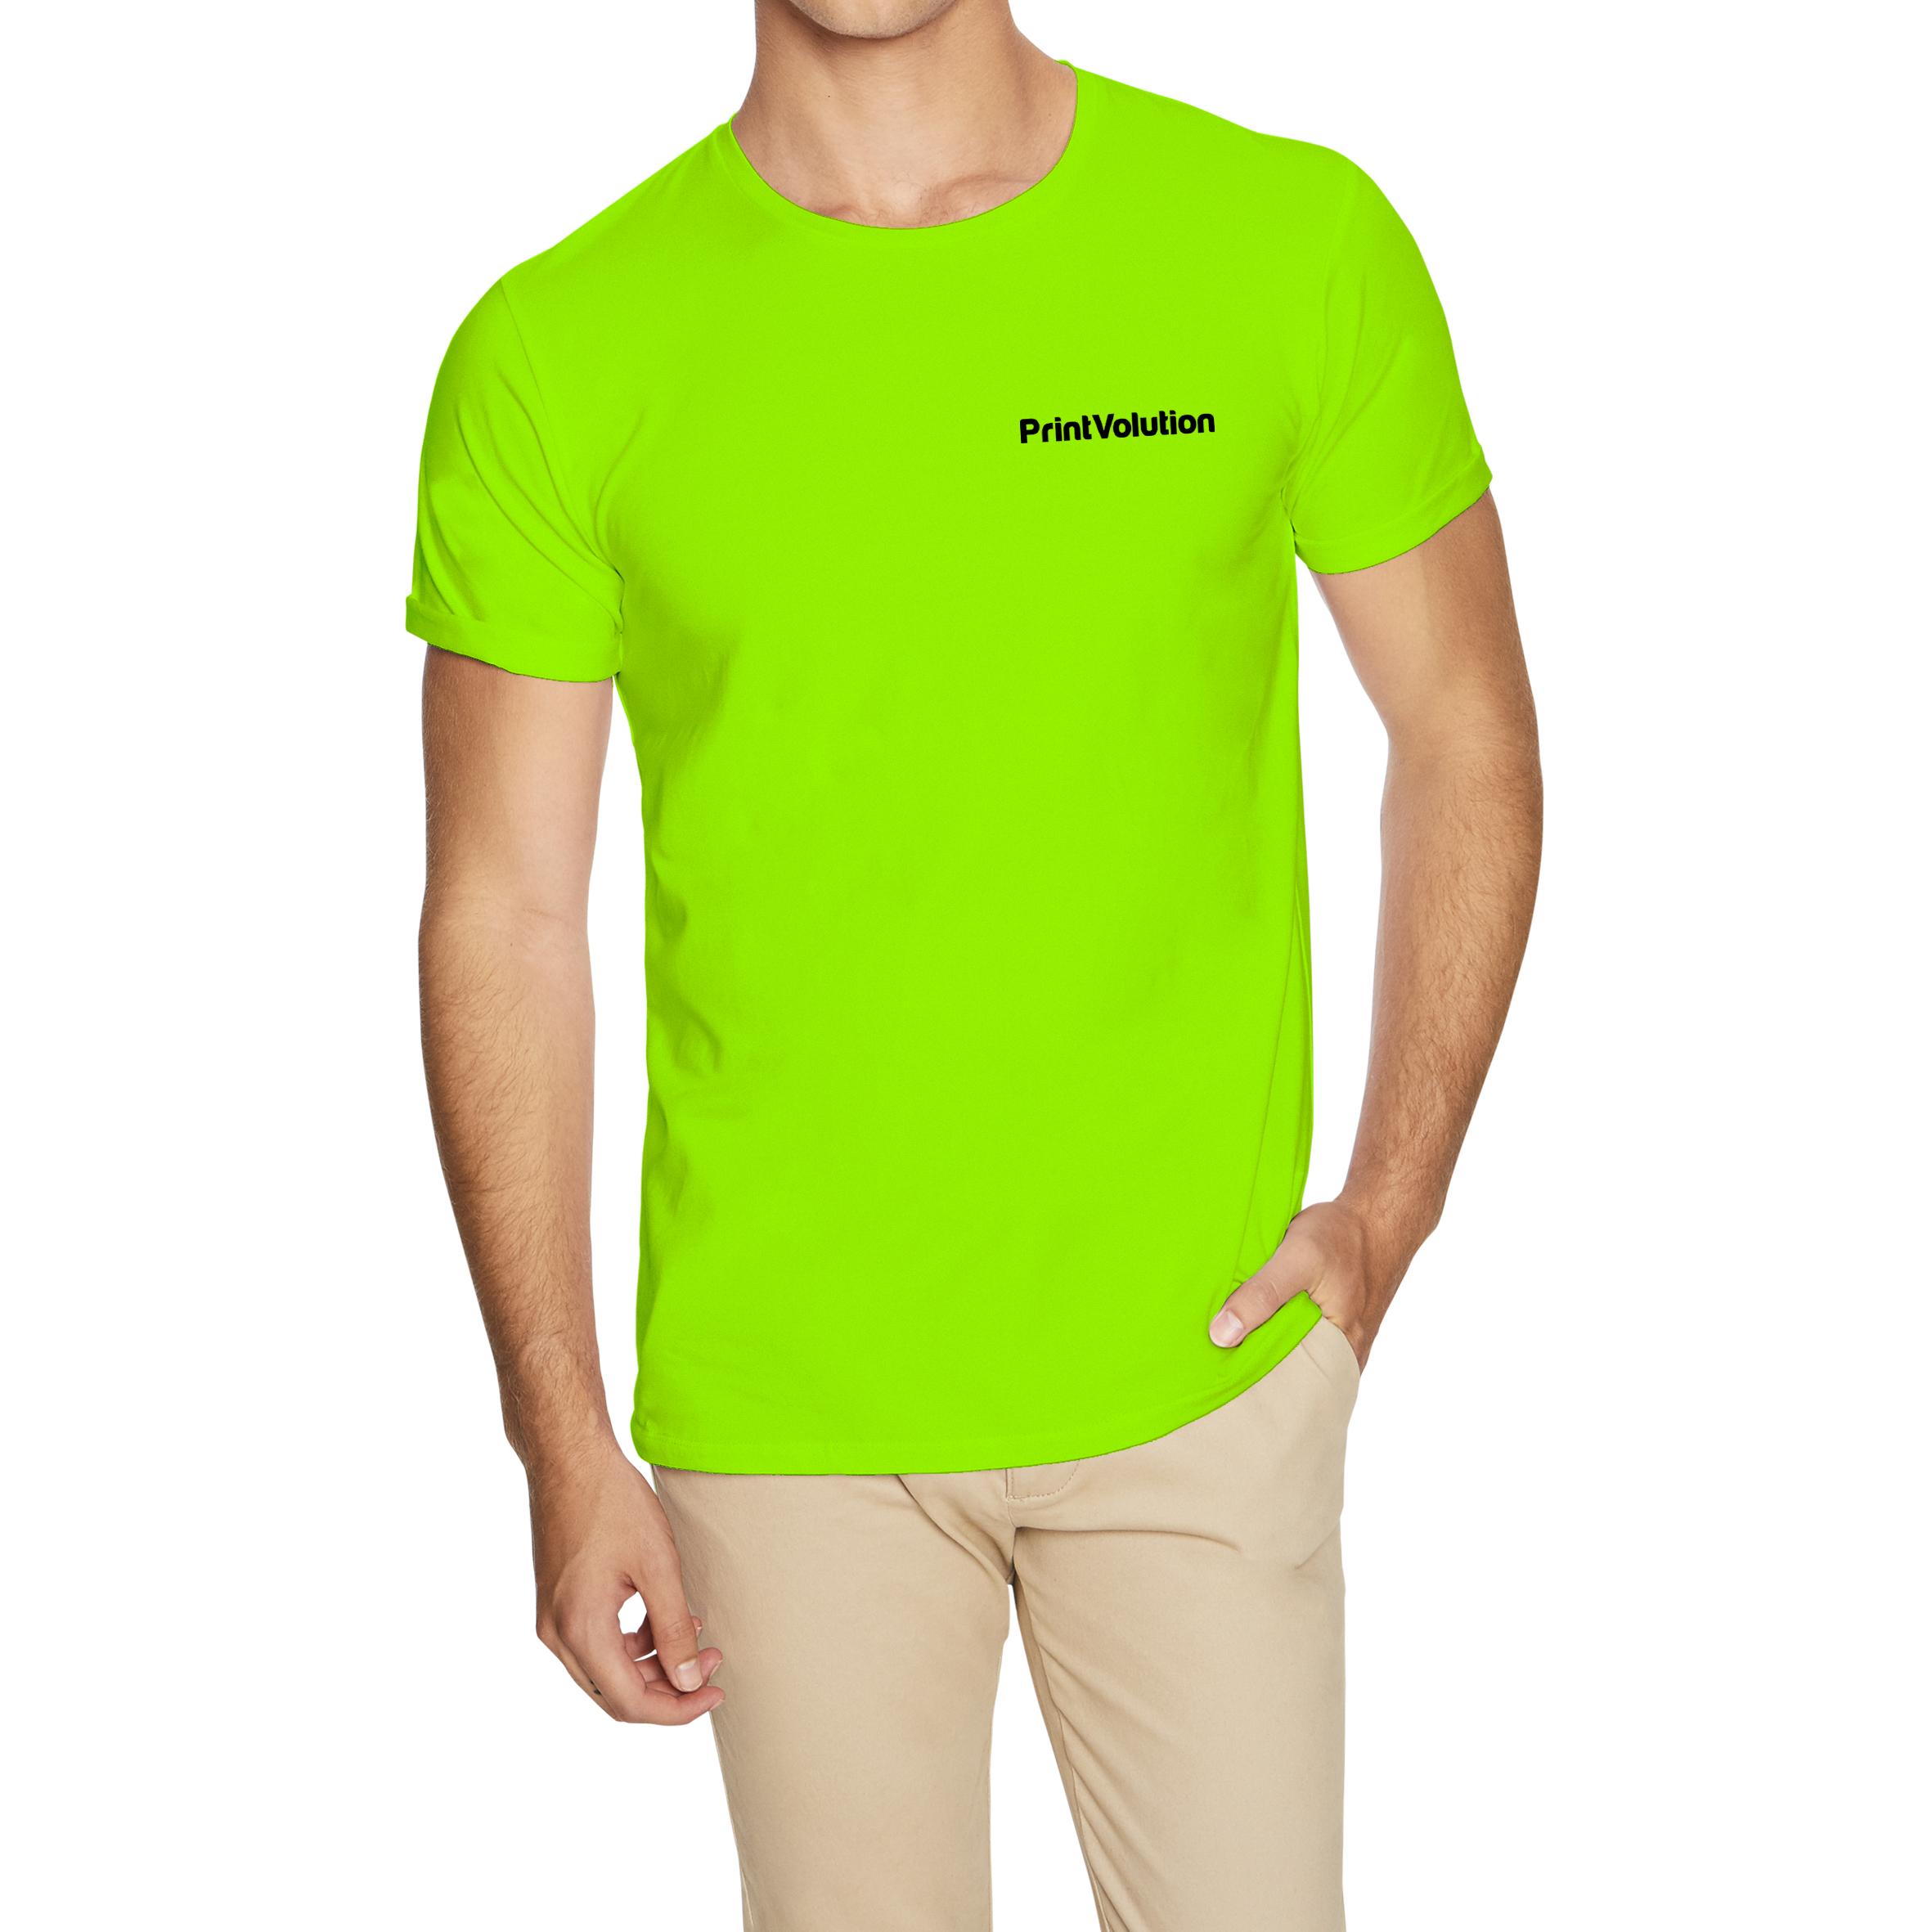 UDF0118 Lime Green